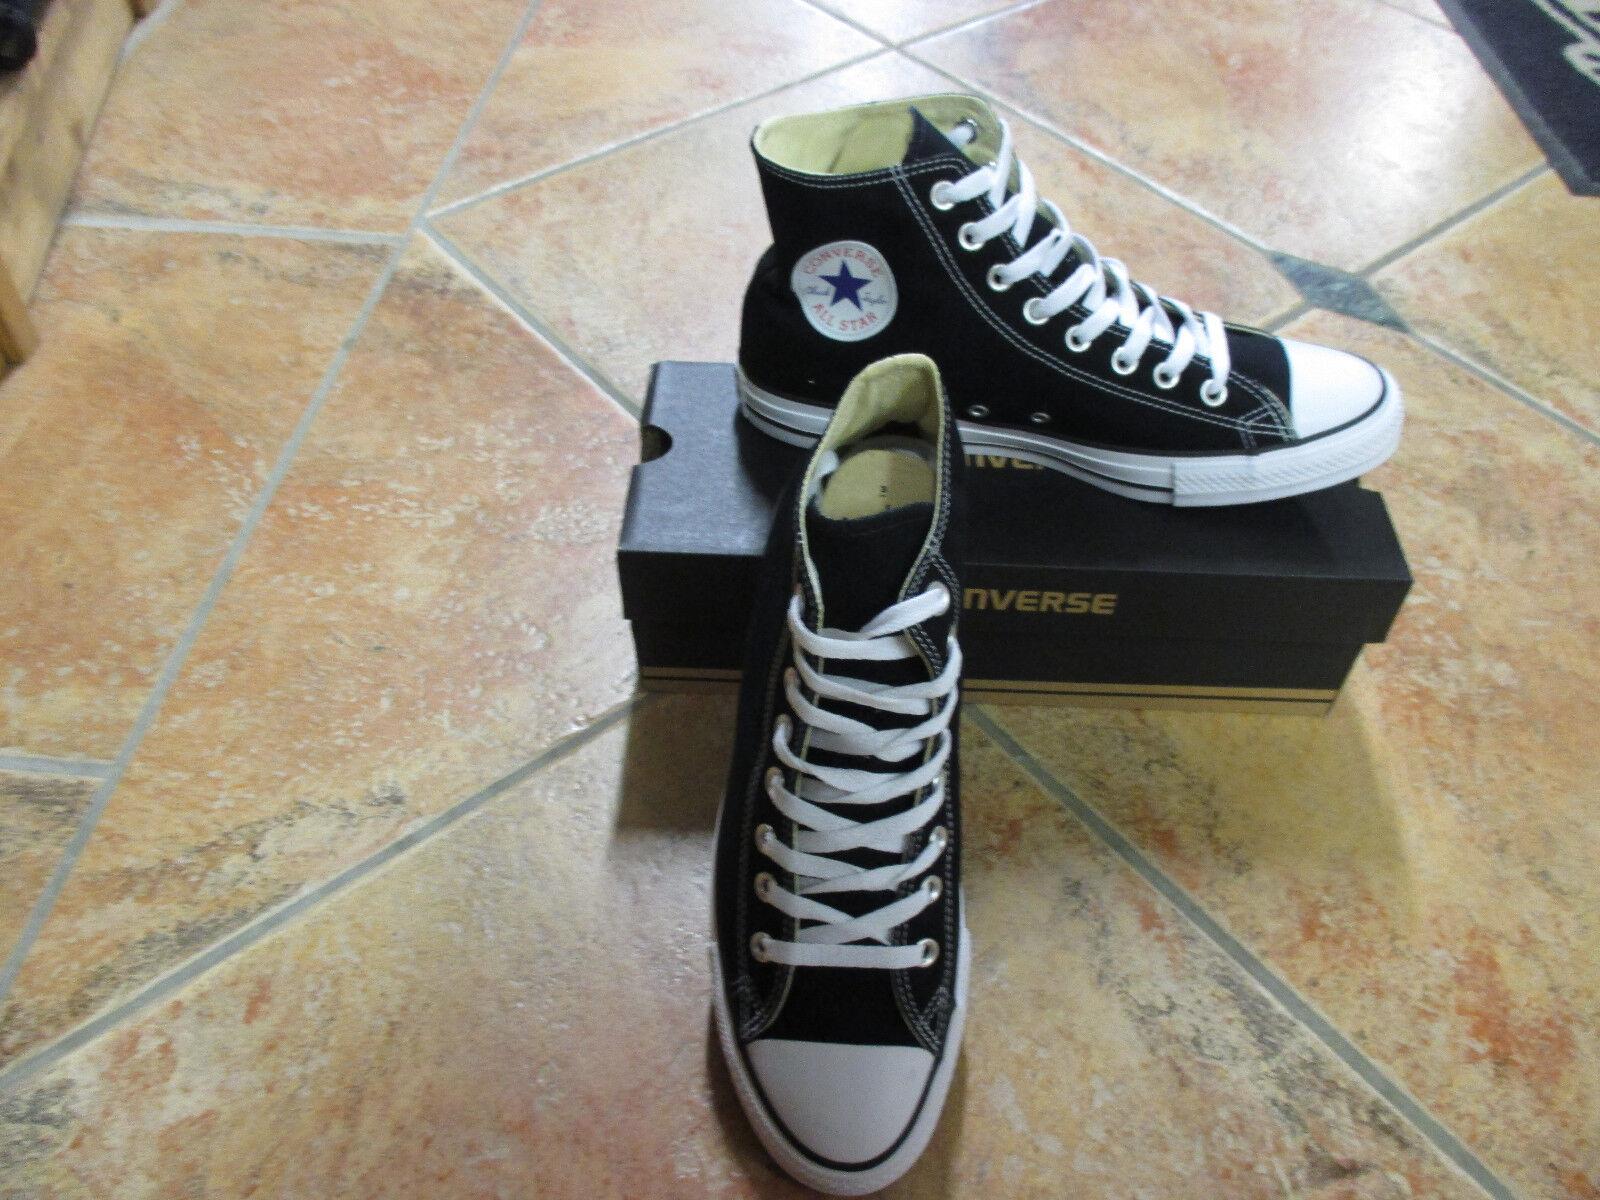 Converse Chucks All Star HI Größe 46,5 BLACK schwarz M9160C Neu Sneaker